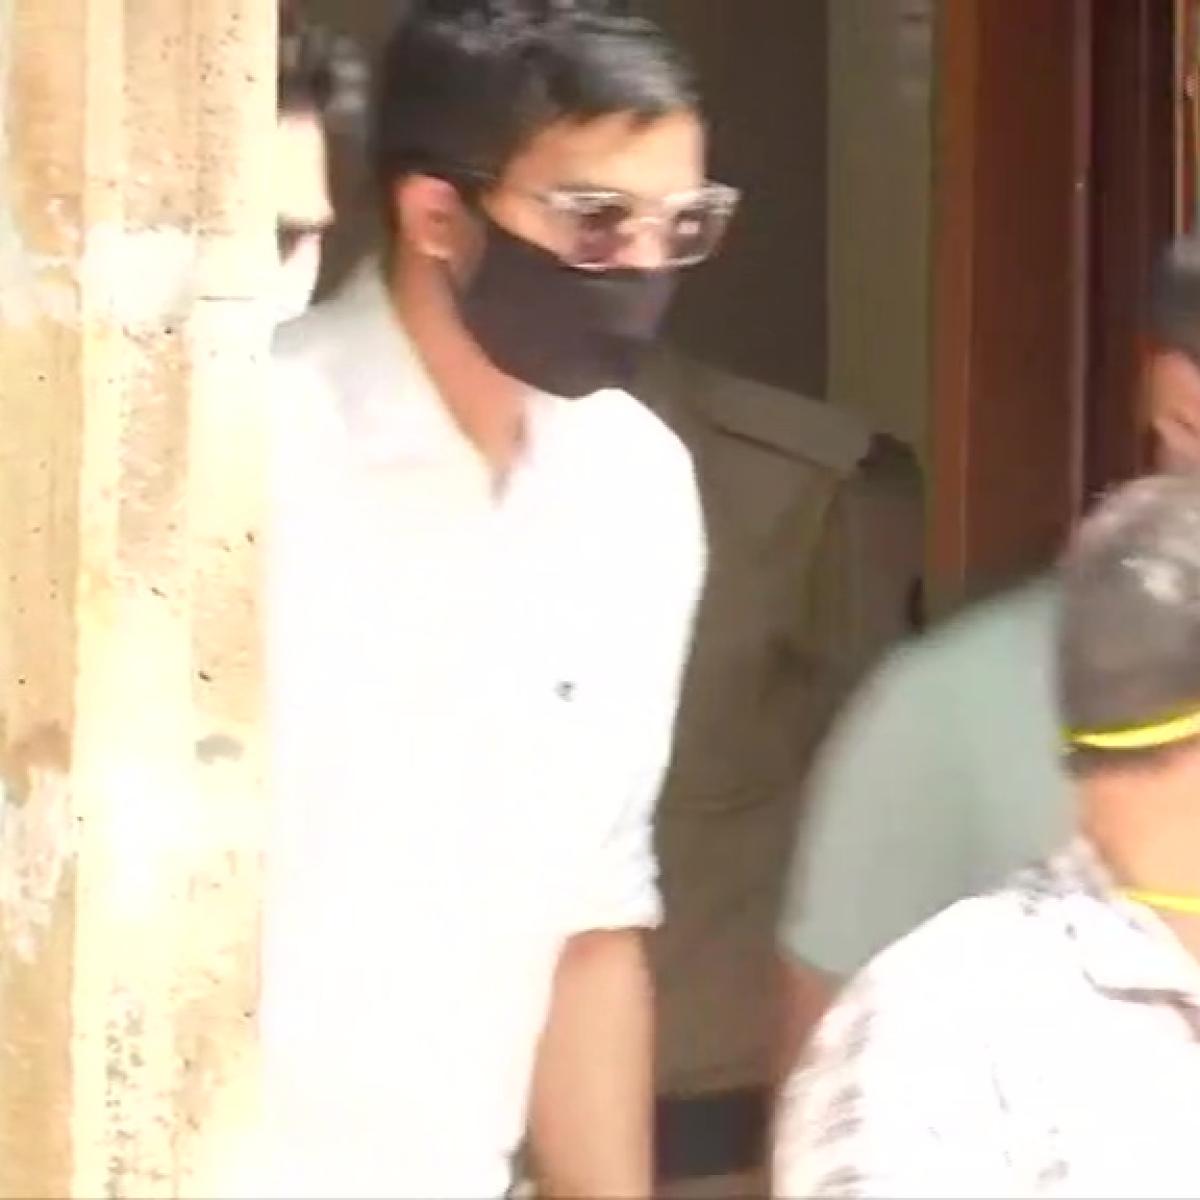 NCB arrests Dharma Entertainment's former executive producer Kshitij Prasad